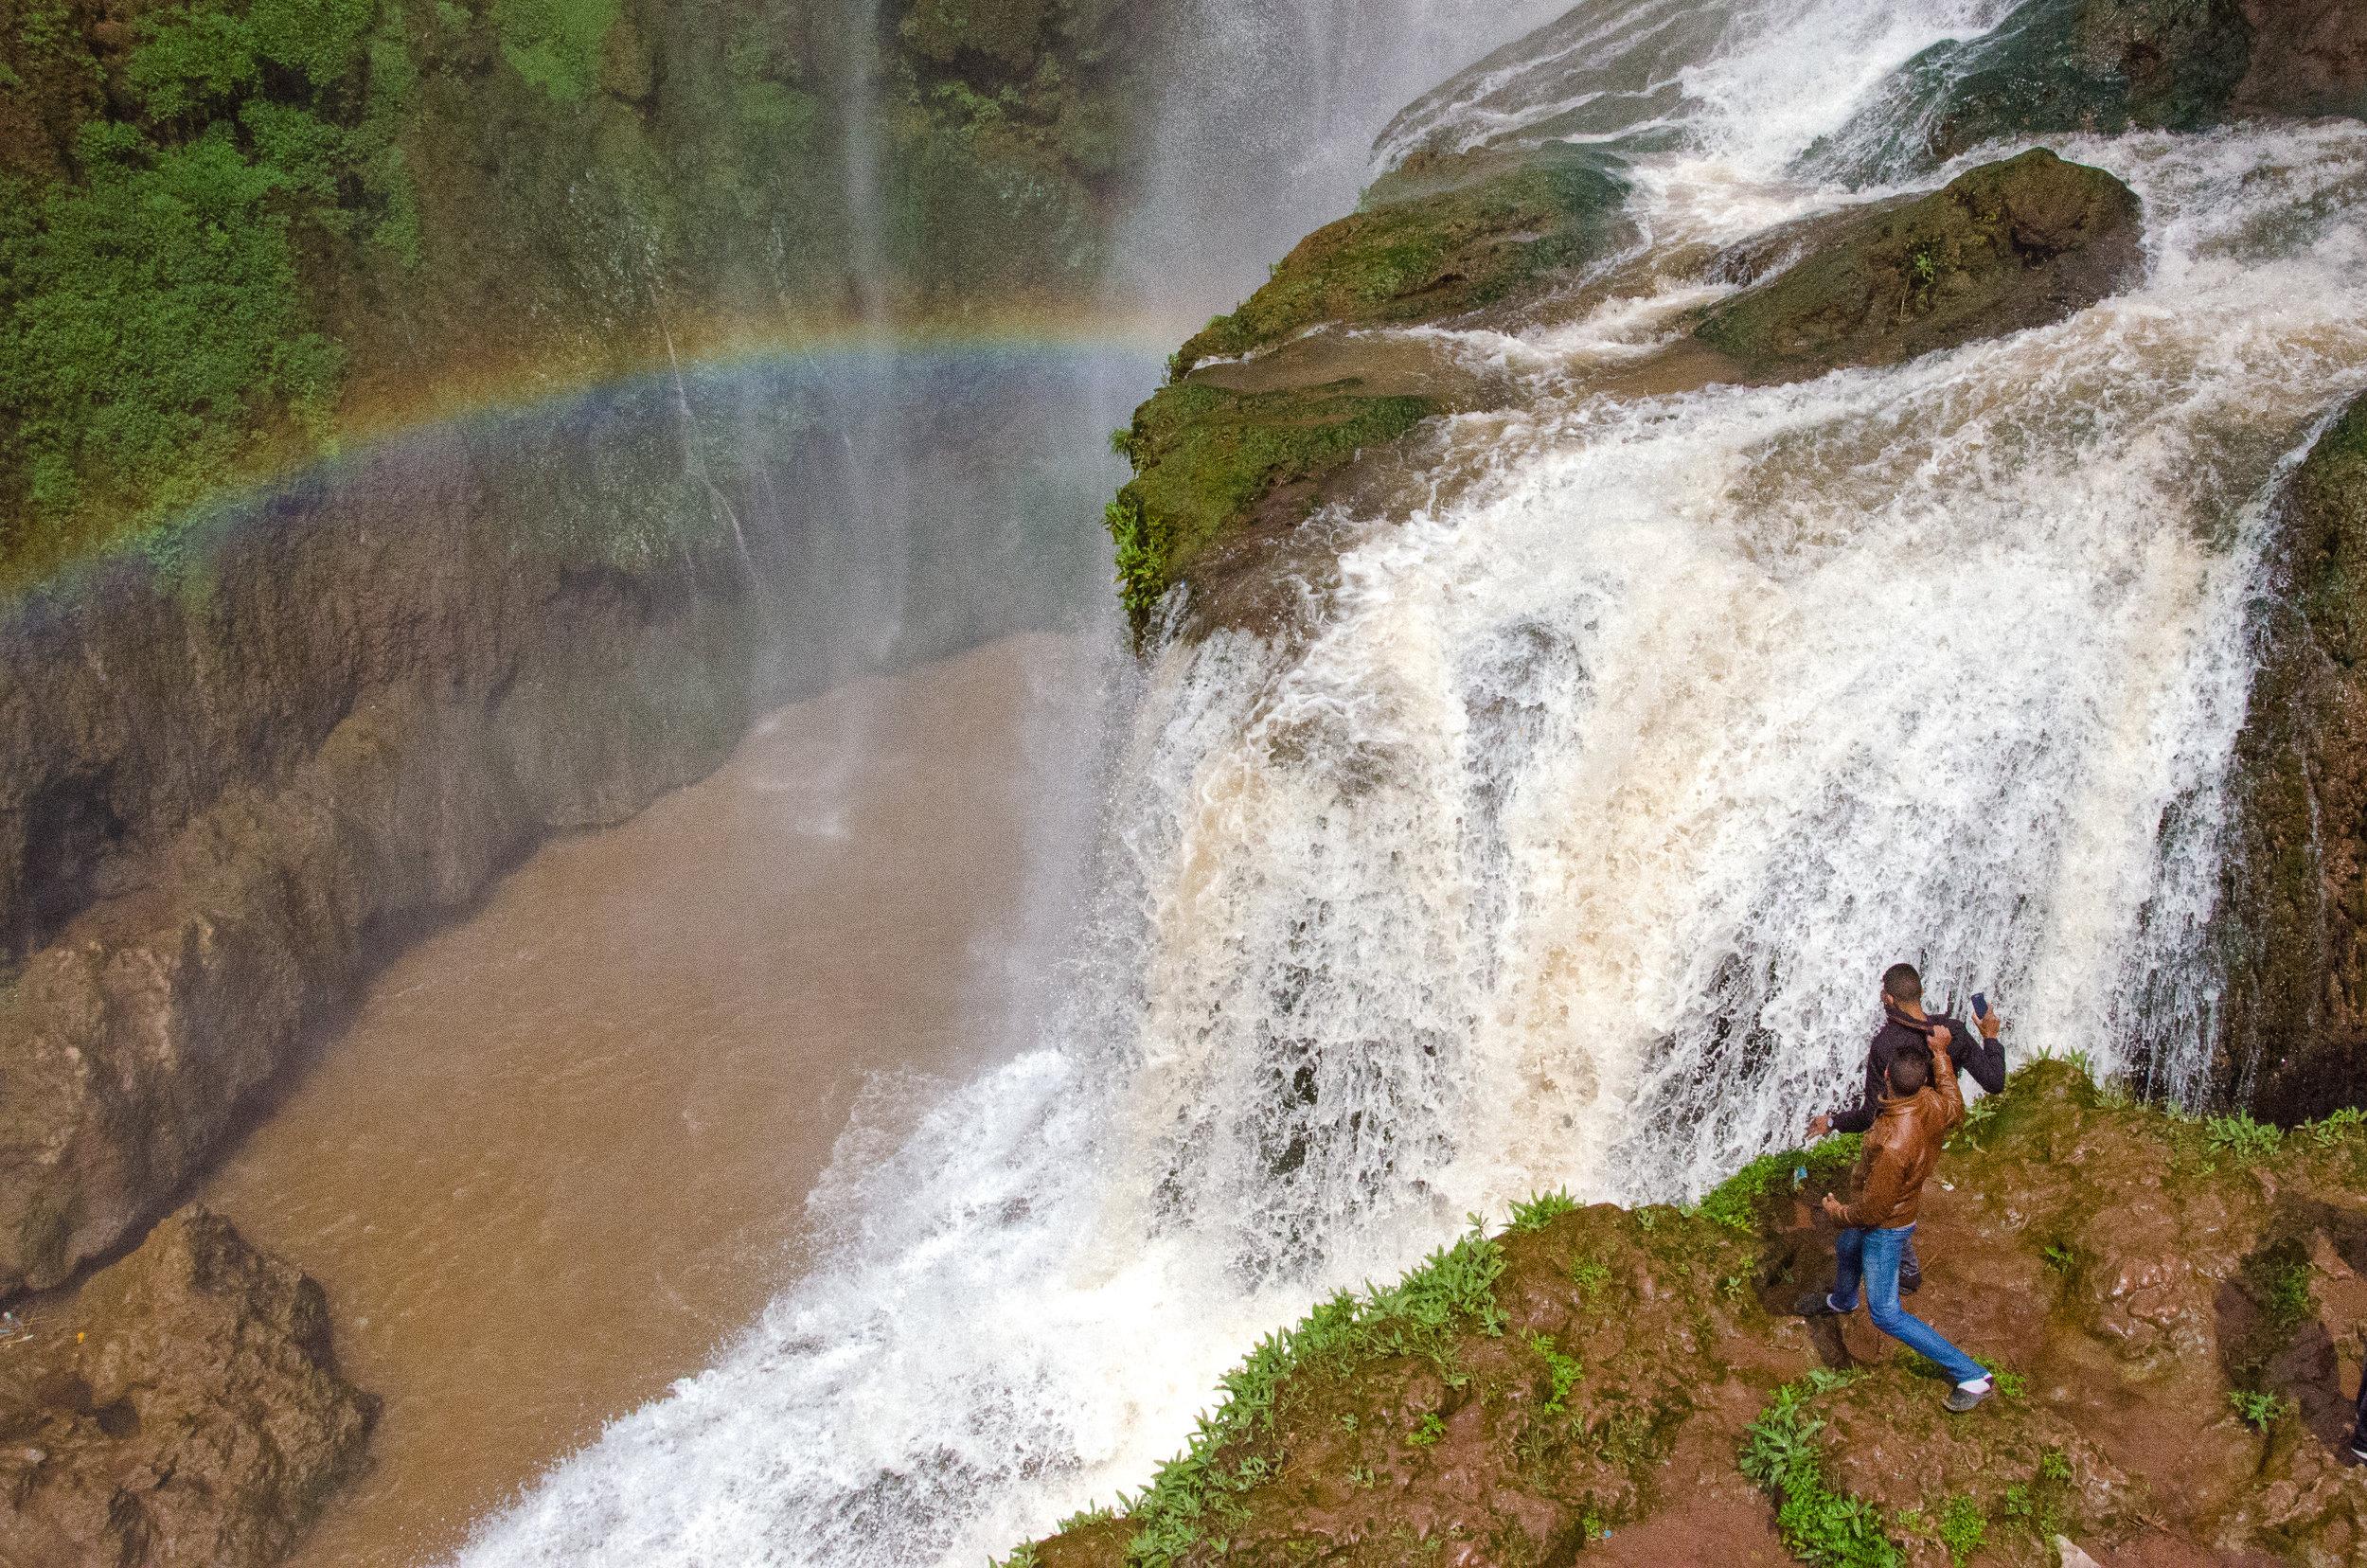 waterfalls_03.jpg